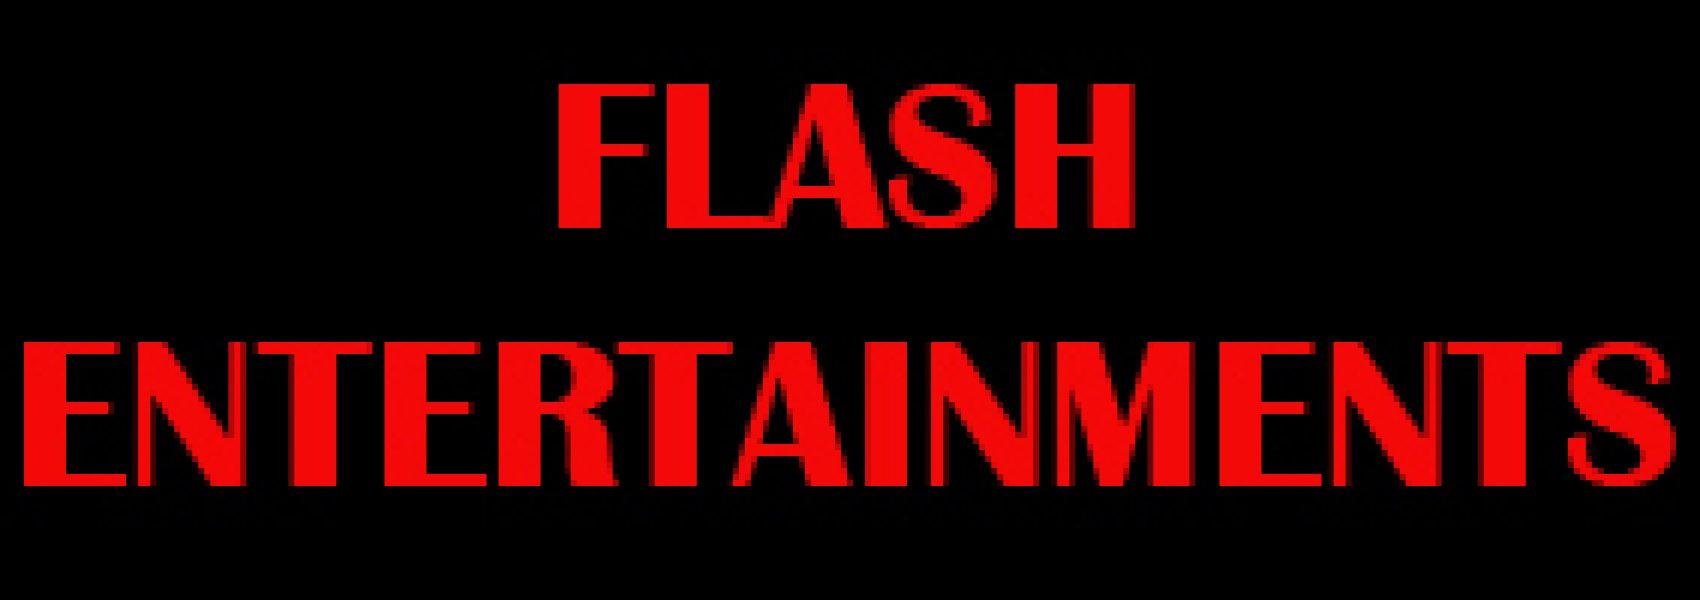 Flash Entertainments Logo